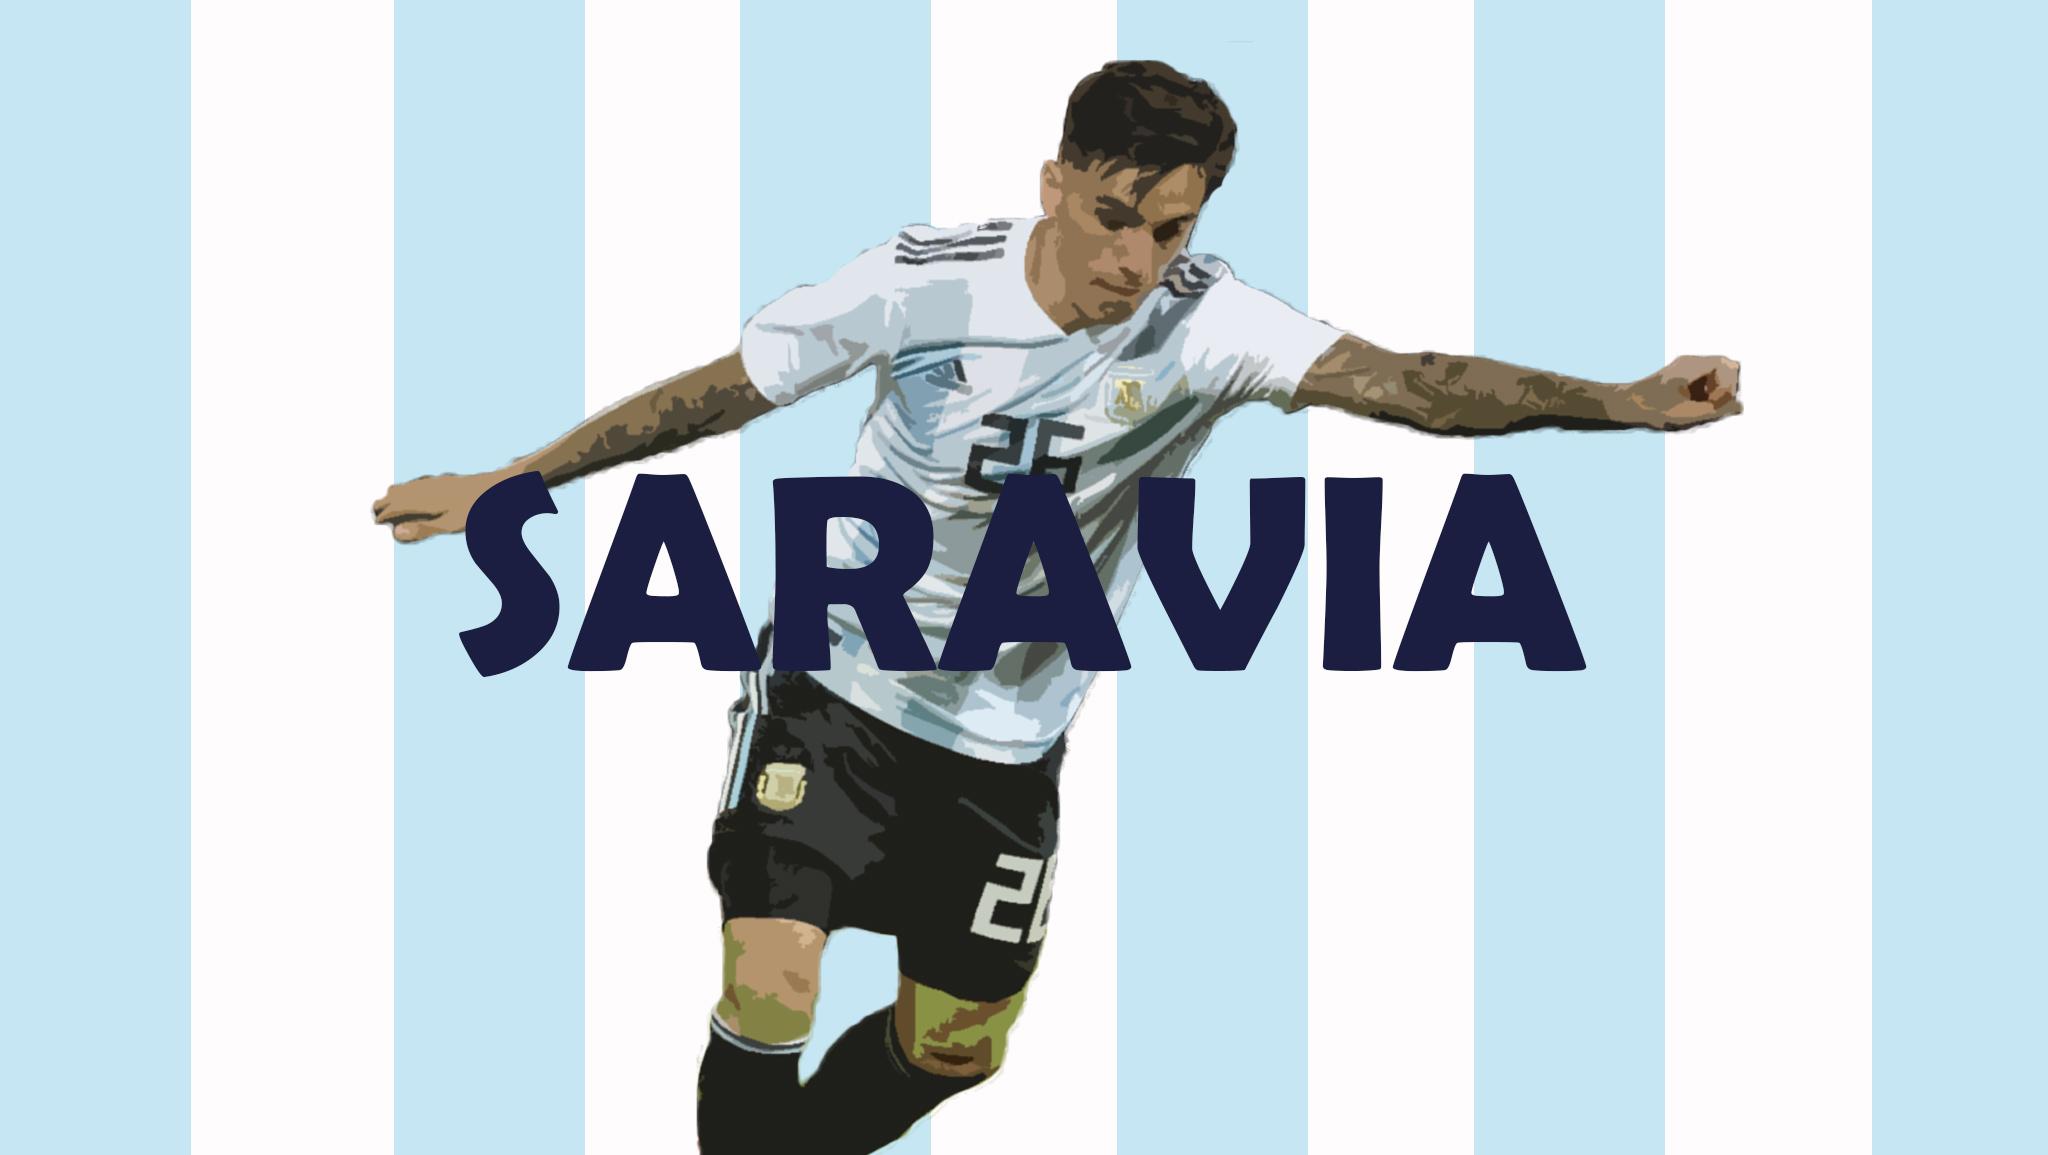 Saravia Porträt